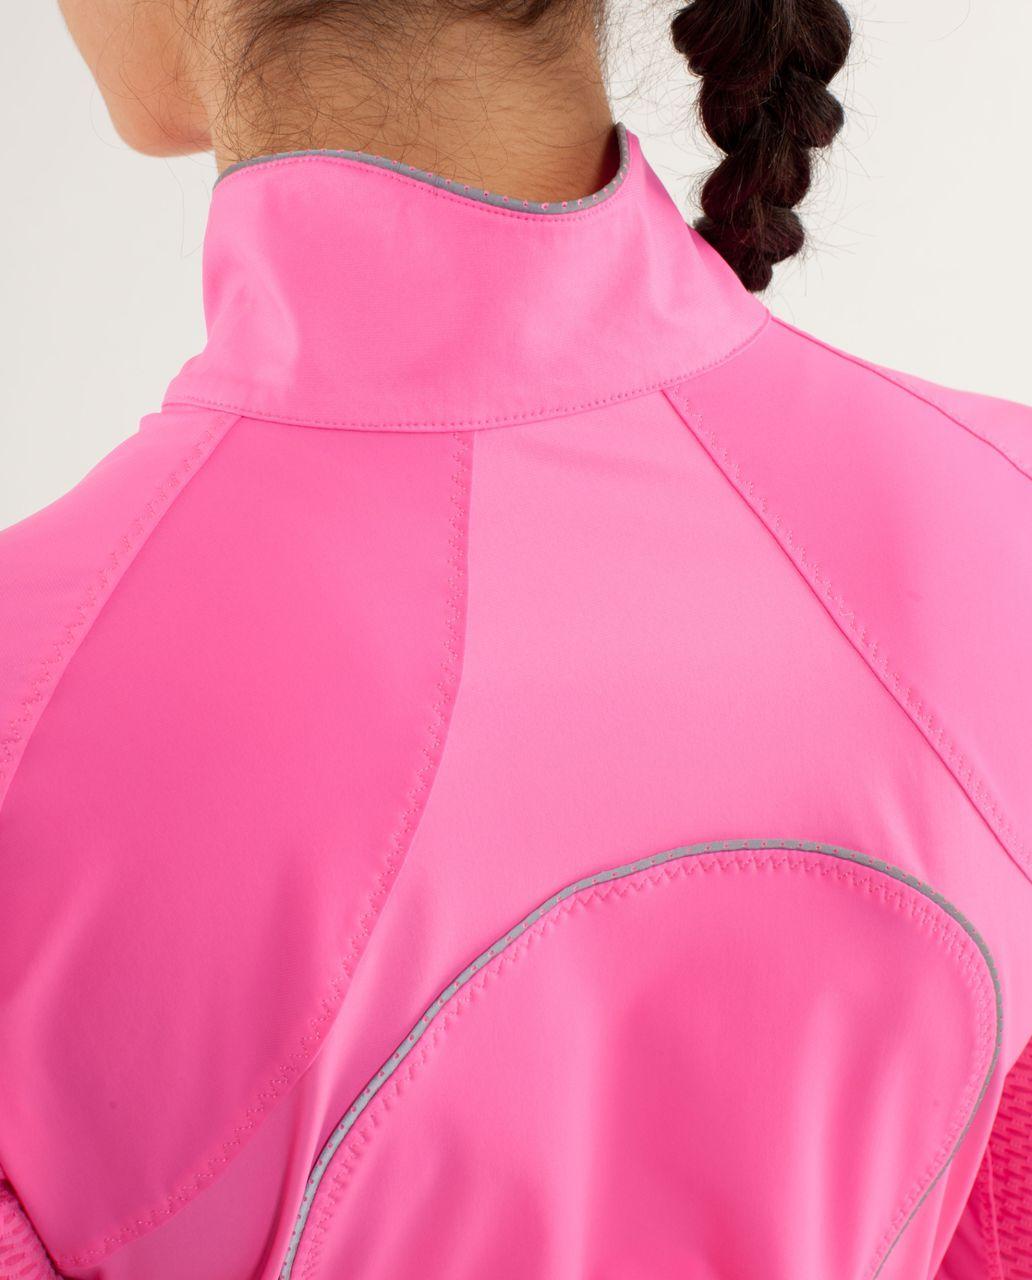 Lululemon Paceline Jacket - Pinkelicious